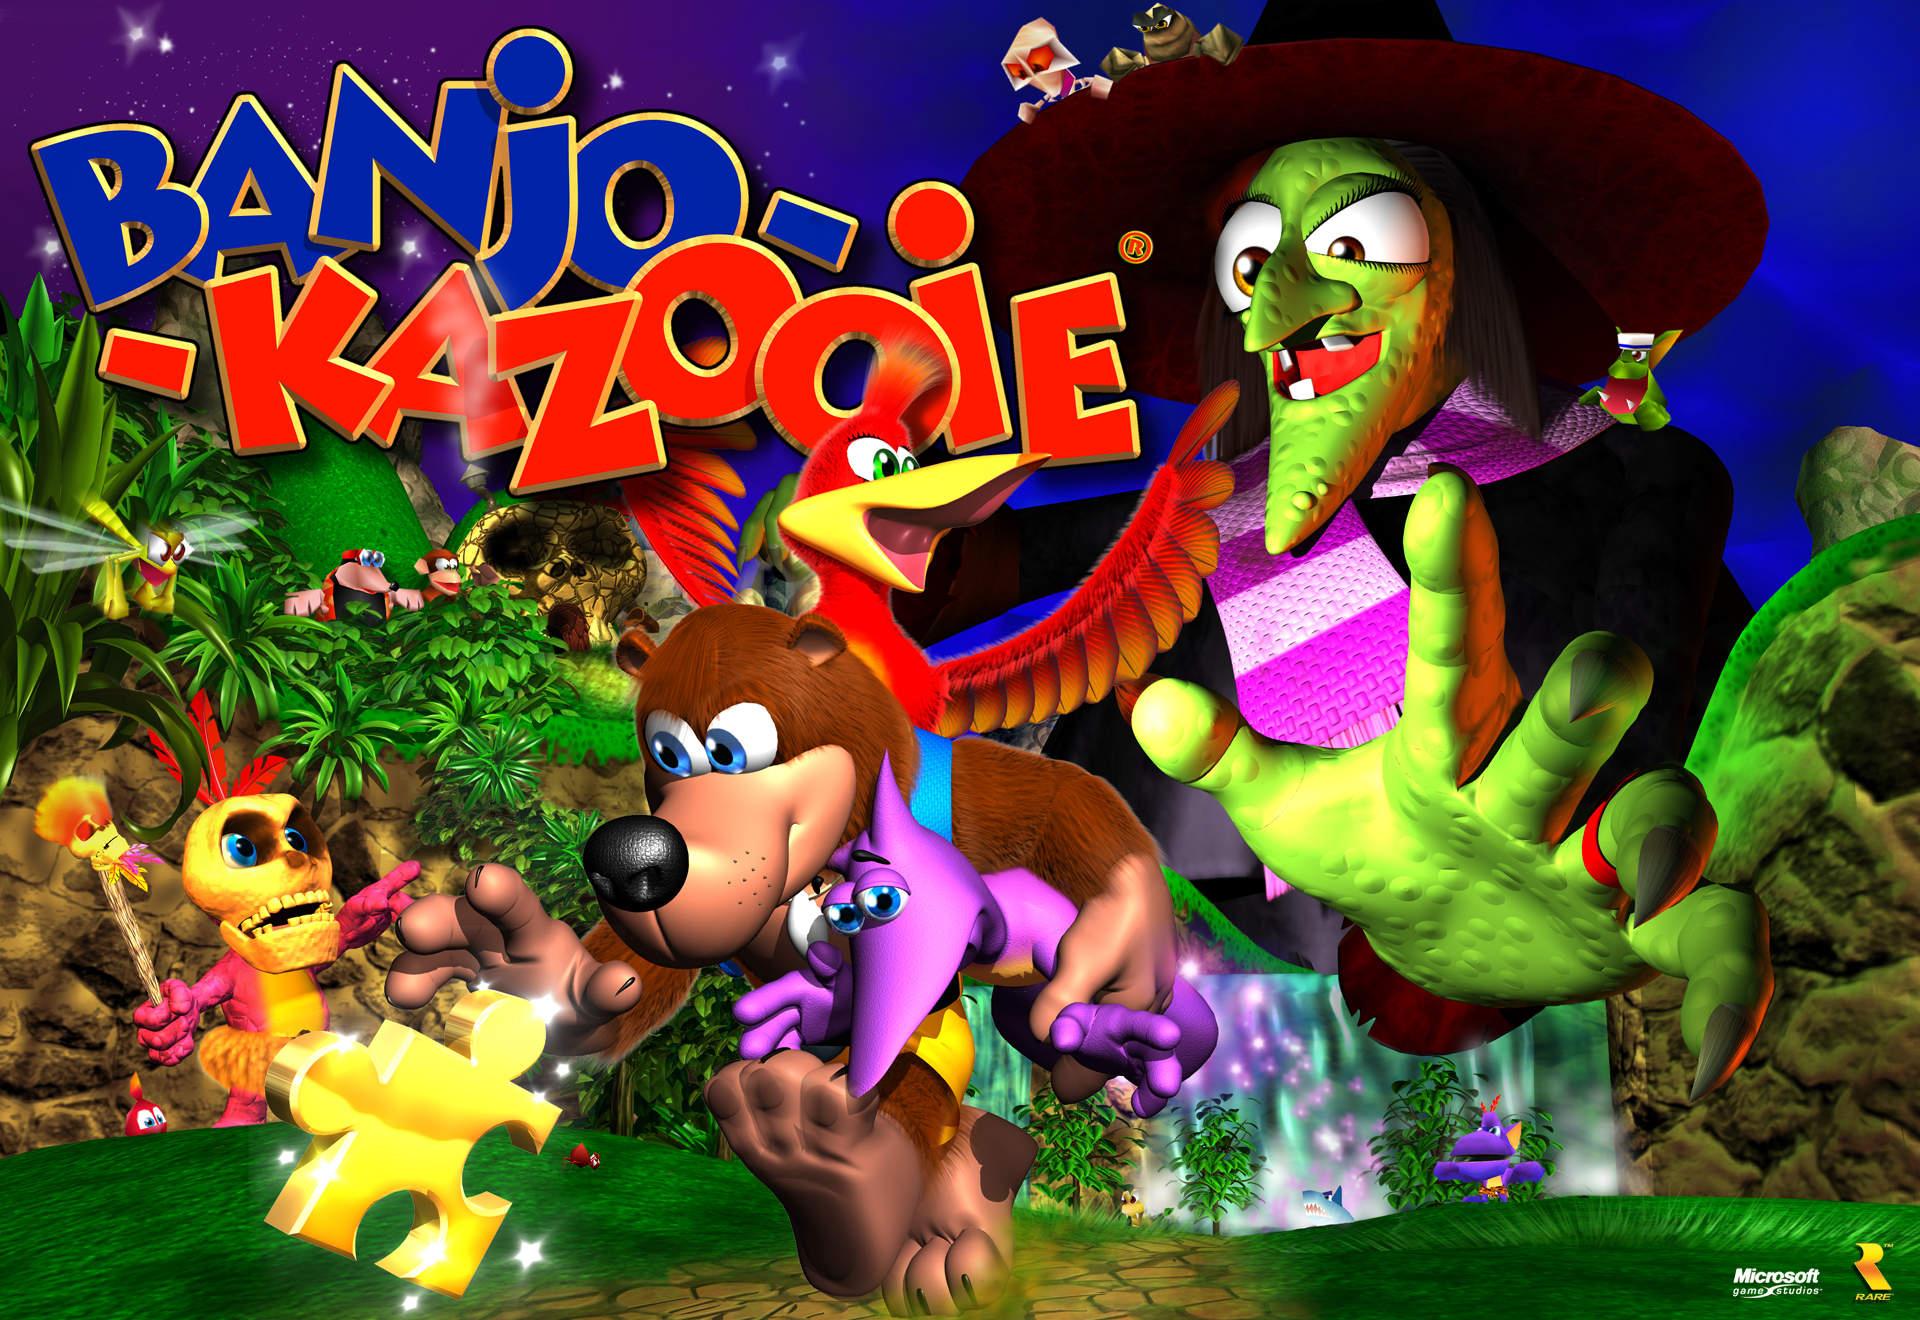 http://vignette4.wikia.nocookie.net/banjokazooie/images/8/85/BKXBLA.jpg/revision/latest?cb=20100425073900